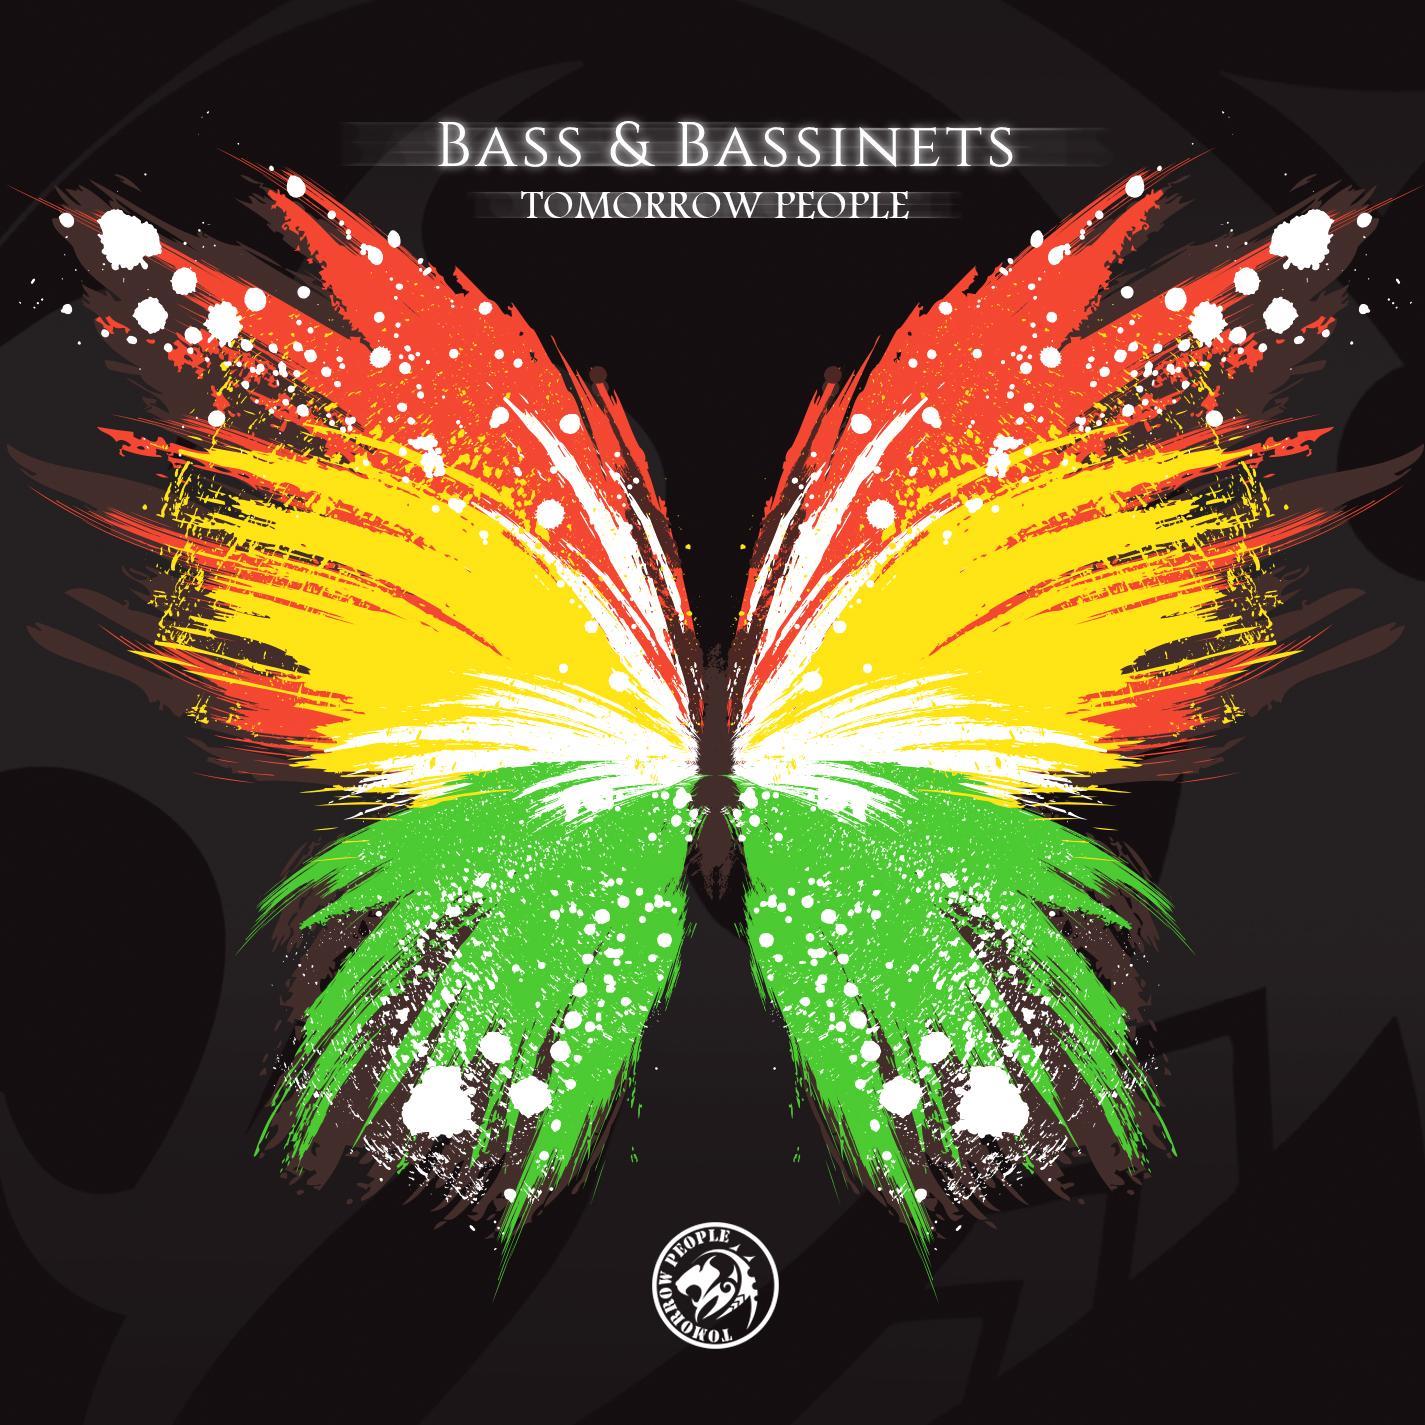 Bass & Bassinets